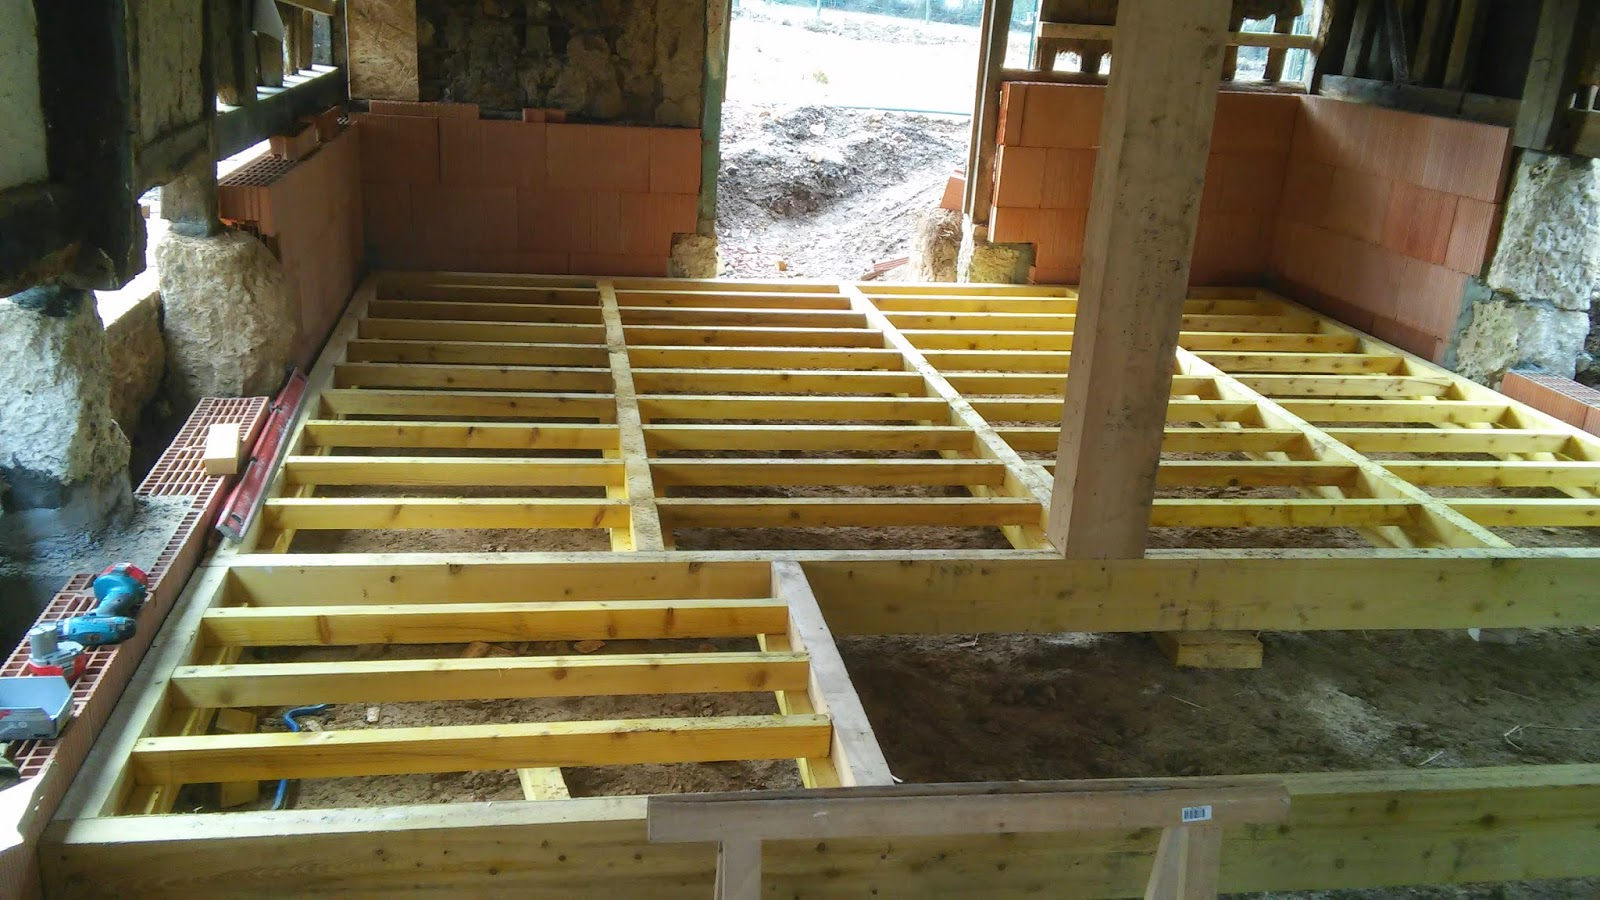 la mare du mesnil tentative d 39 cor novation le plancher de la cave. Black Bedroom Furniture Sets. Home Design Ideas